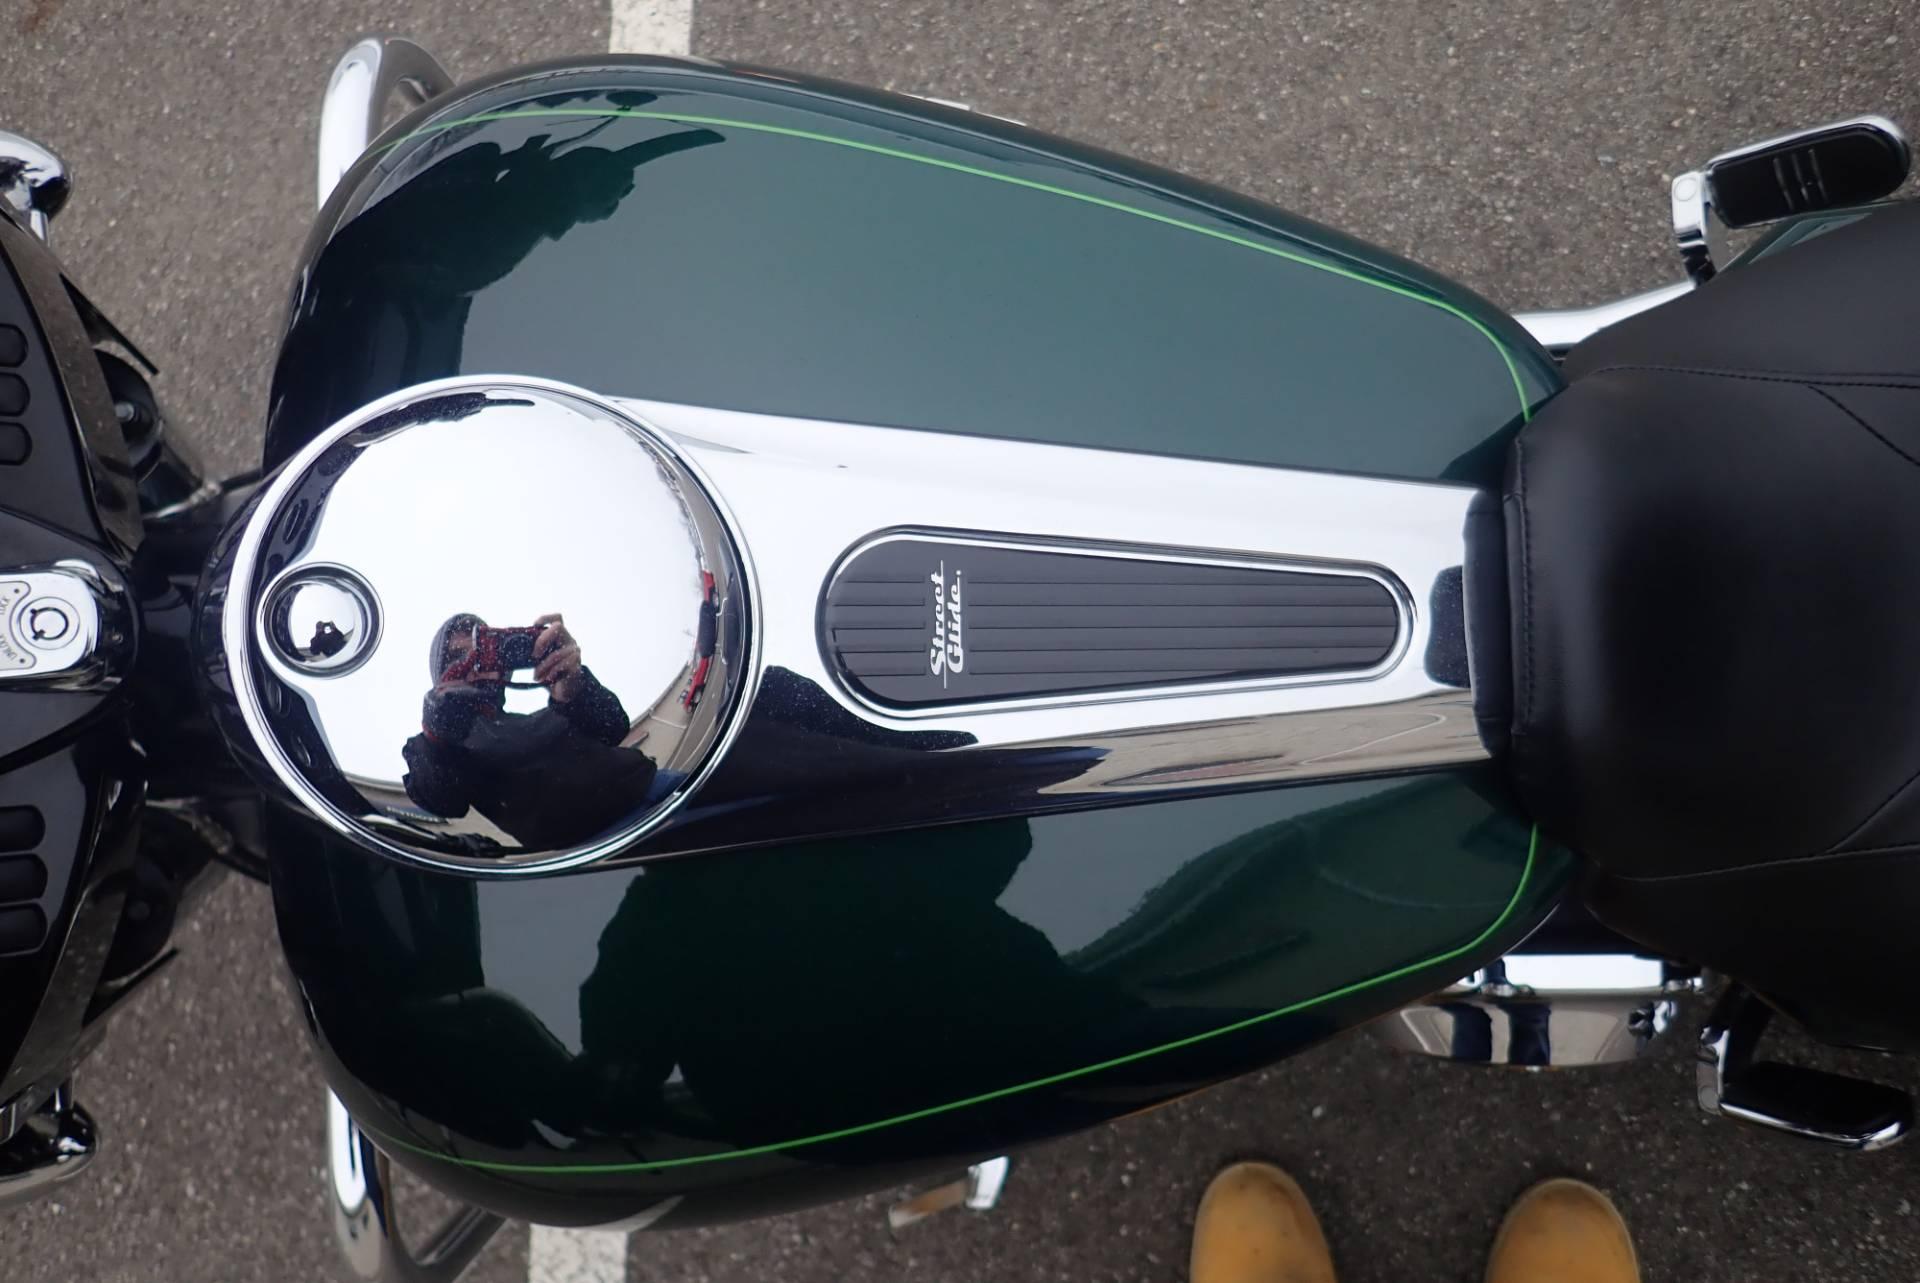 2015 Harley-Davidson Street Glide Special 9